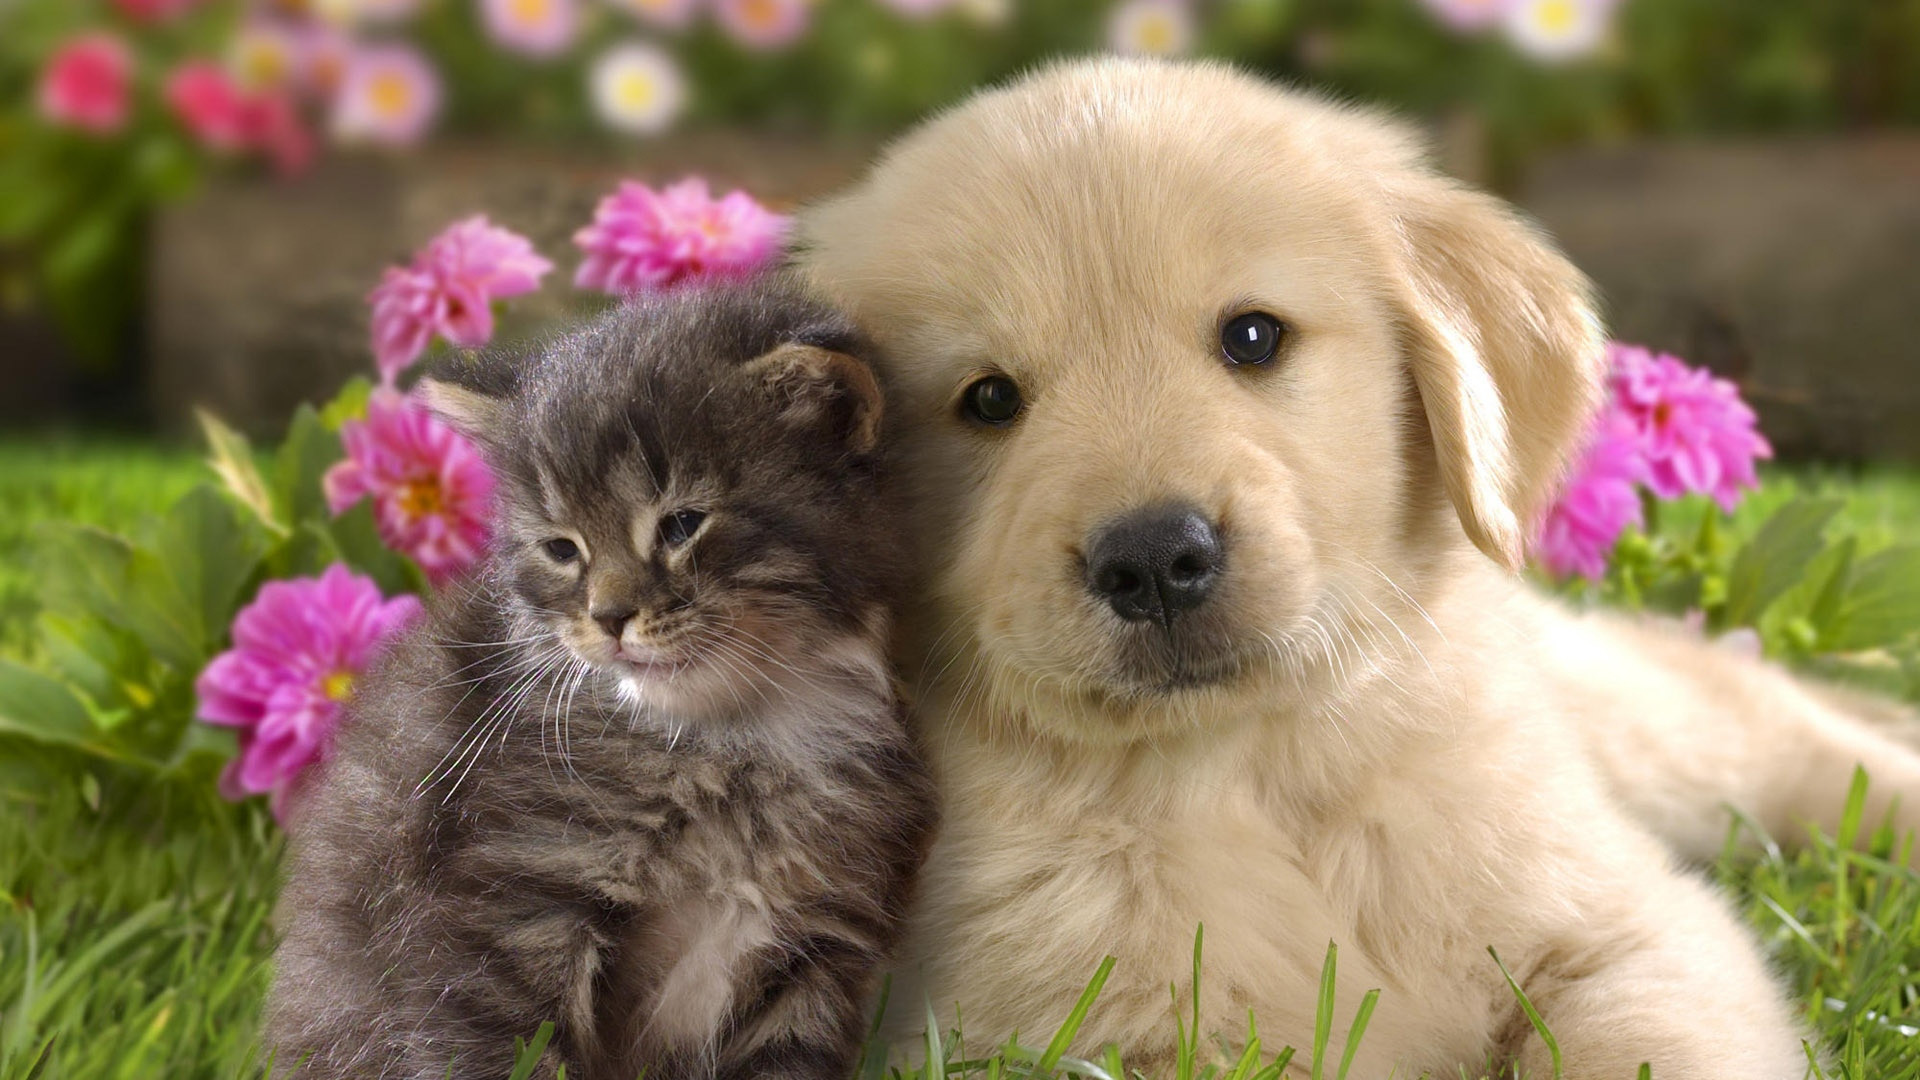 Puppy Desktop Backgrounds 1